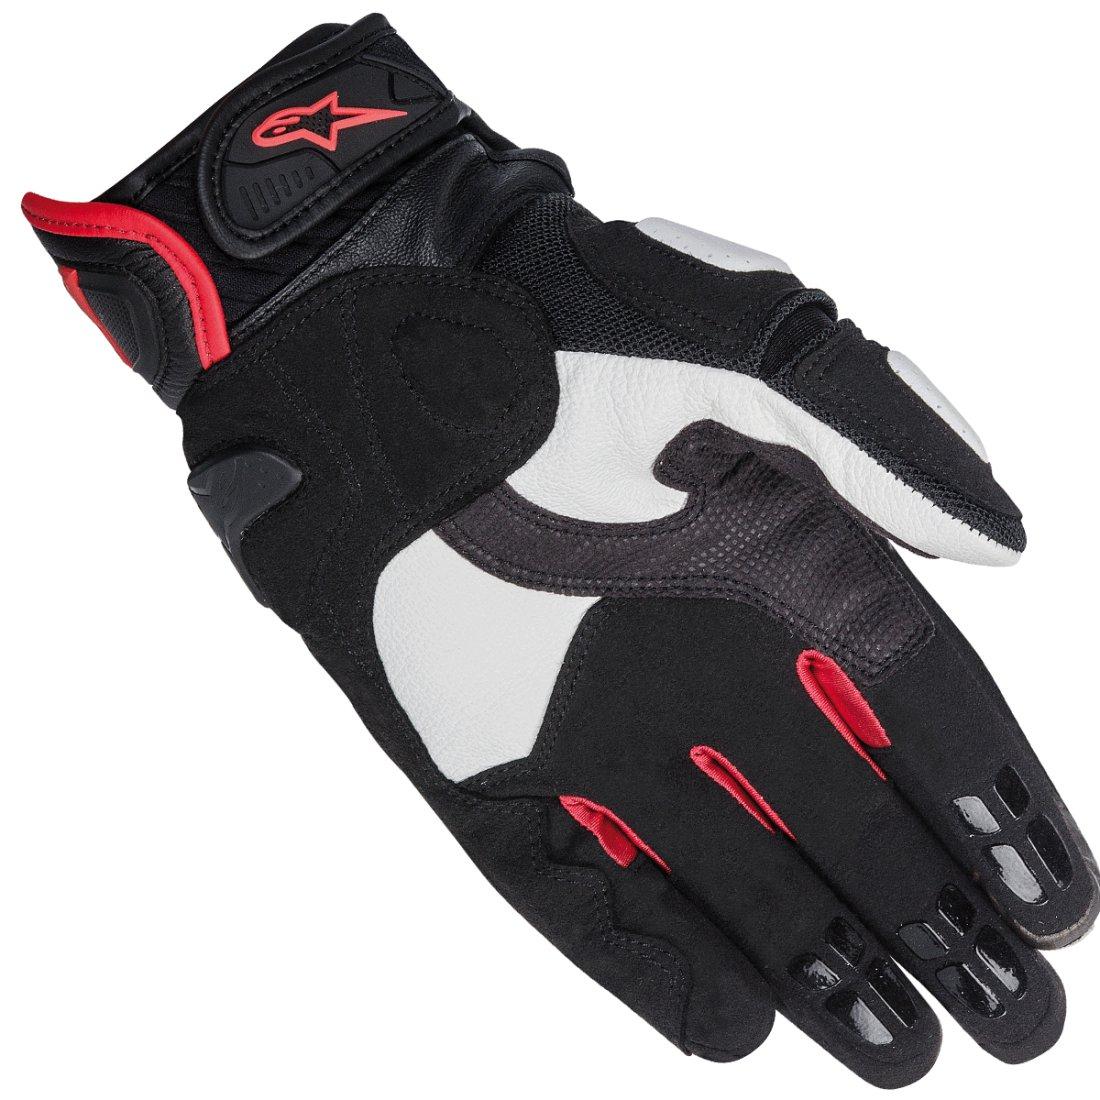 Gants alpinestars gp air n bl r motocard for Black red white boxspringbett